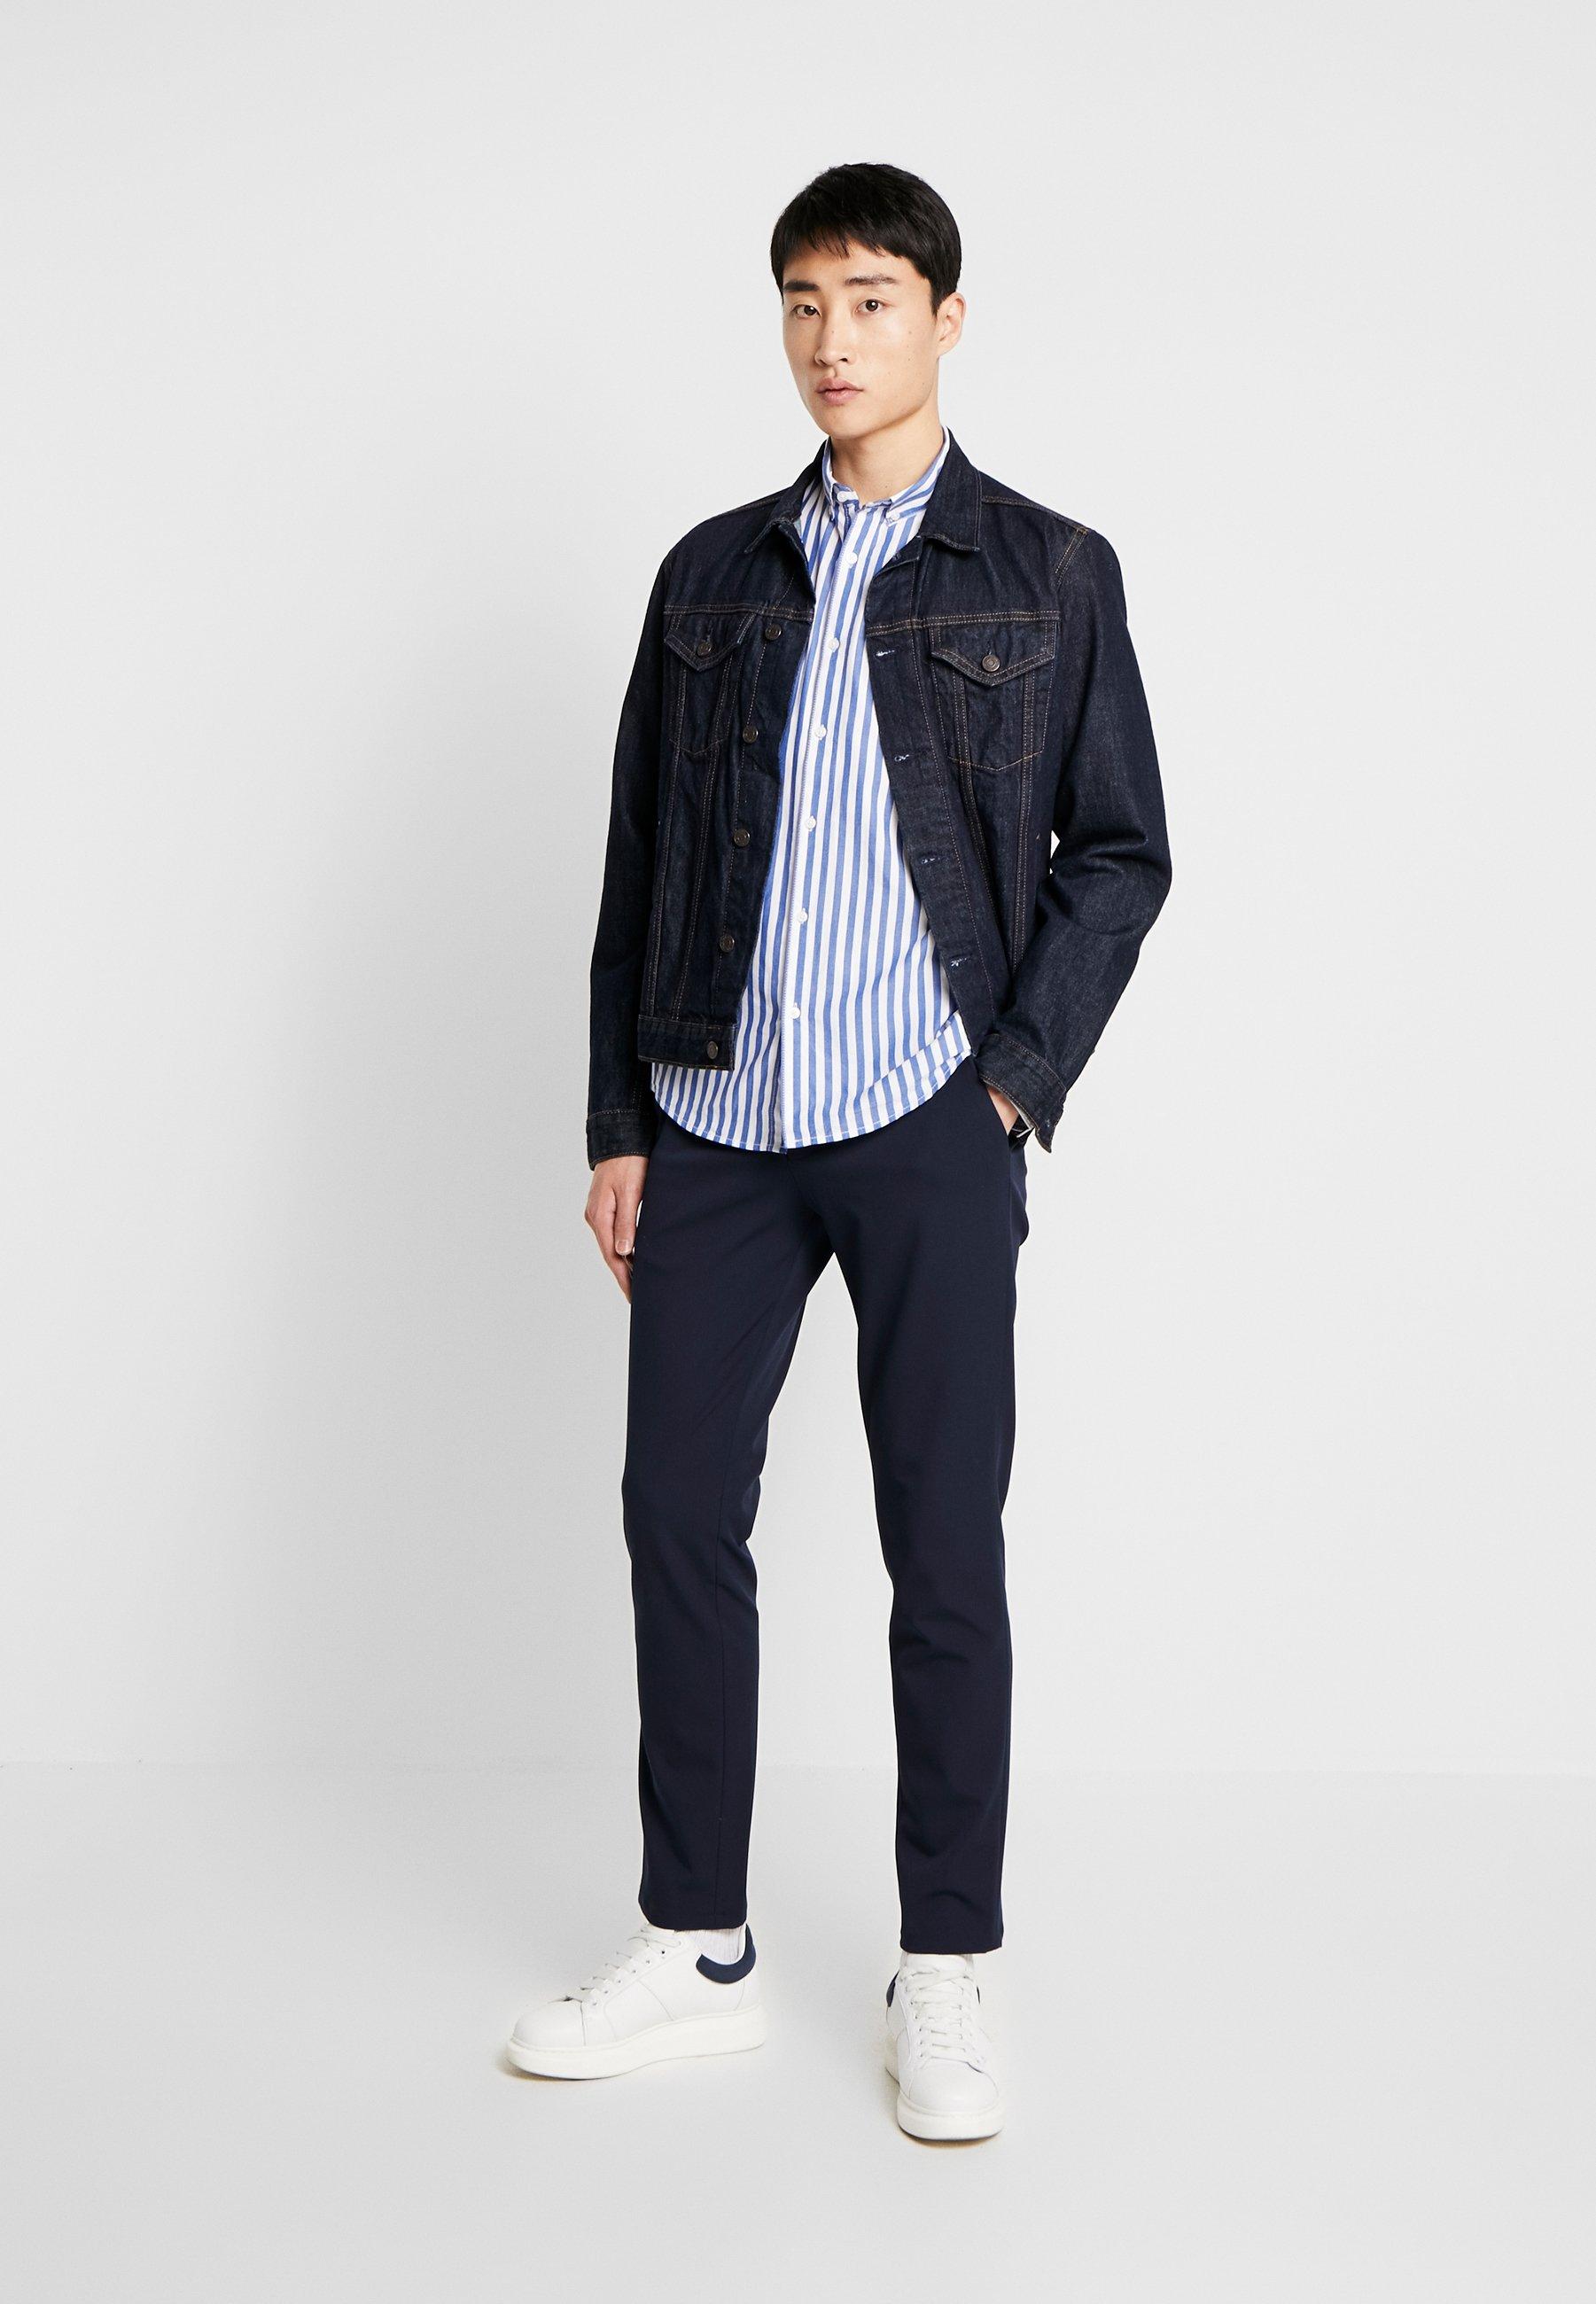 Tom Tailor Denim Check And Stripe Shirts - Skjorter White Blue Bold